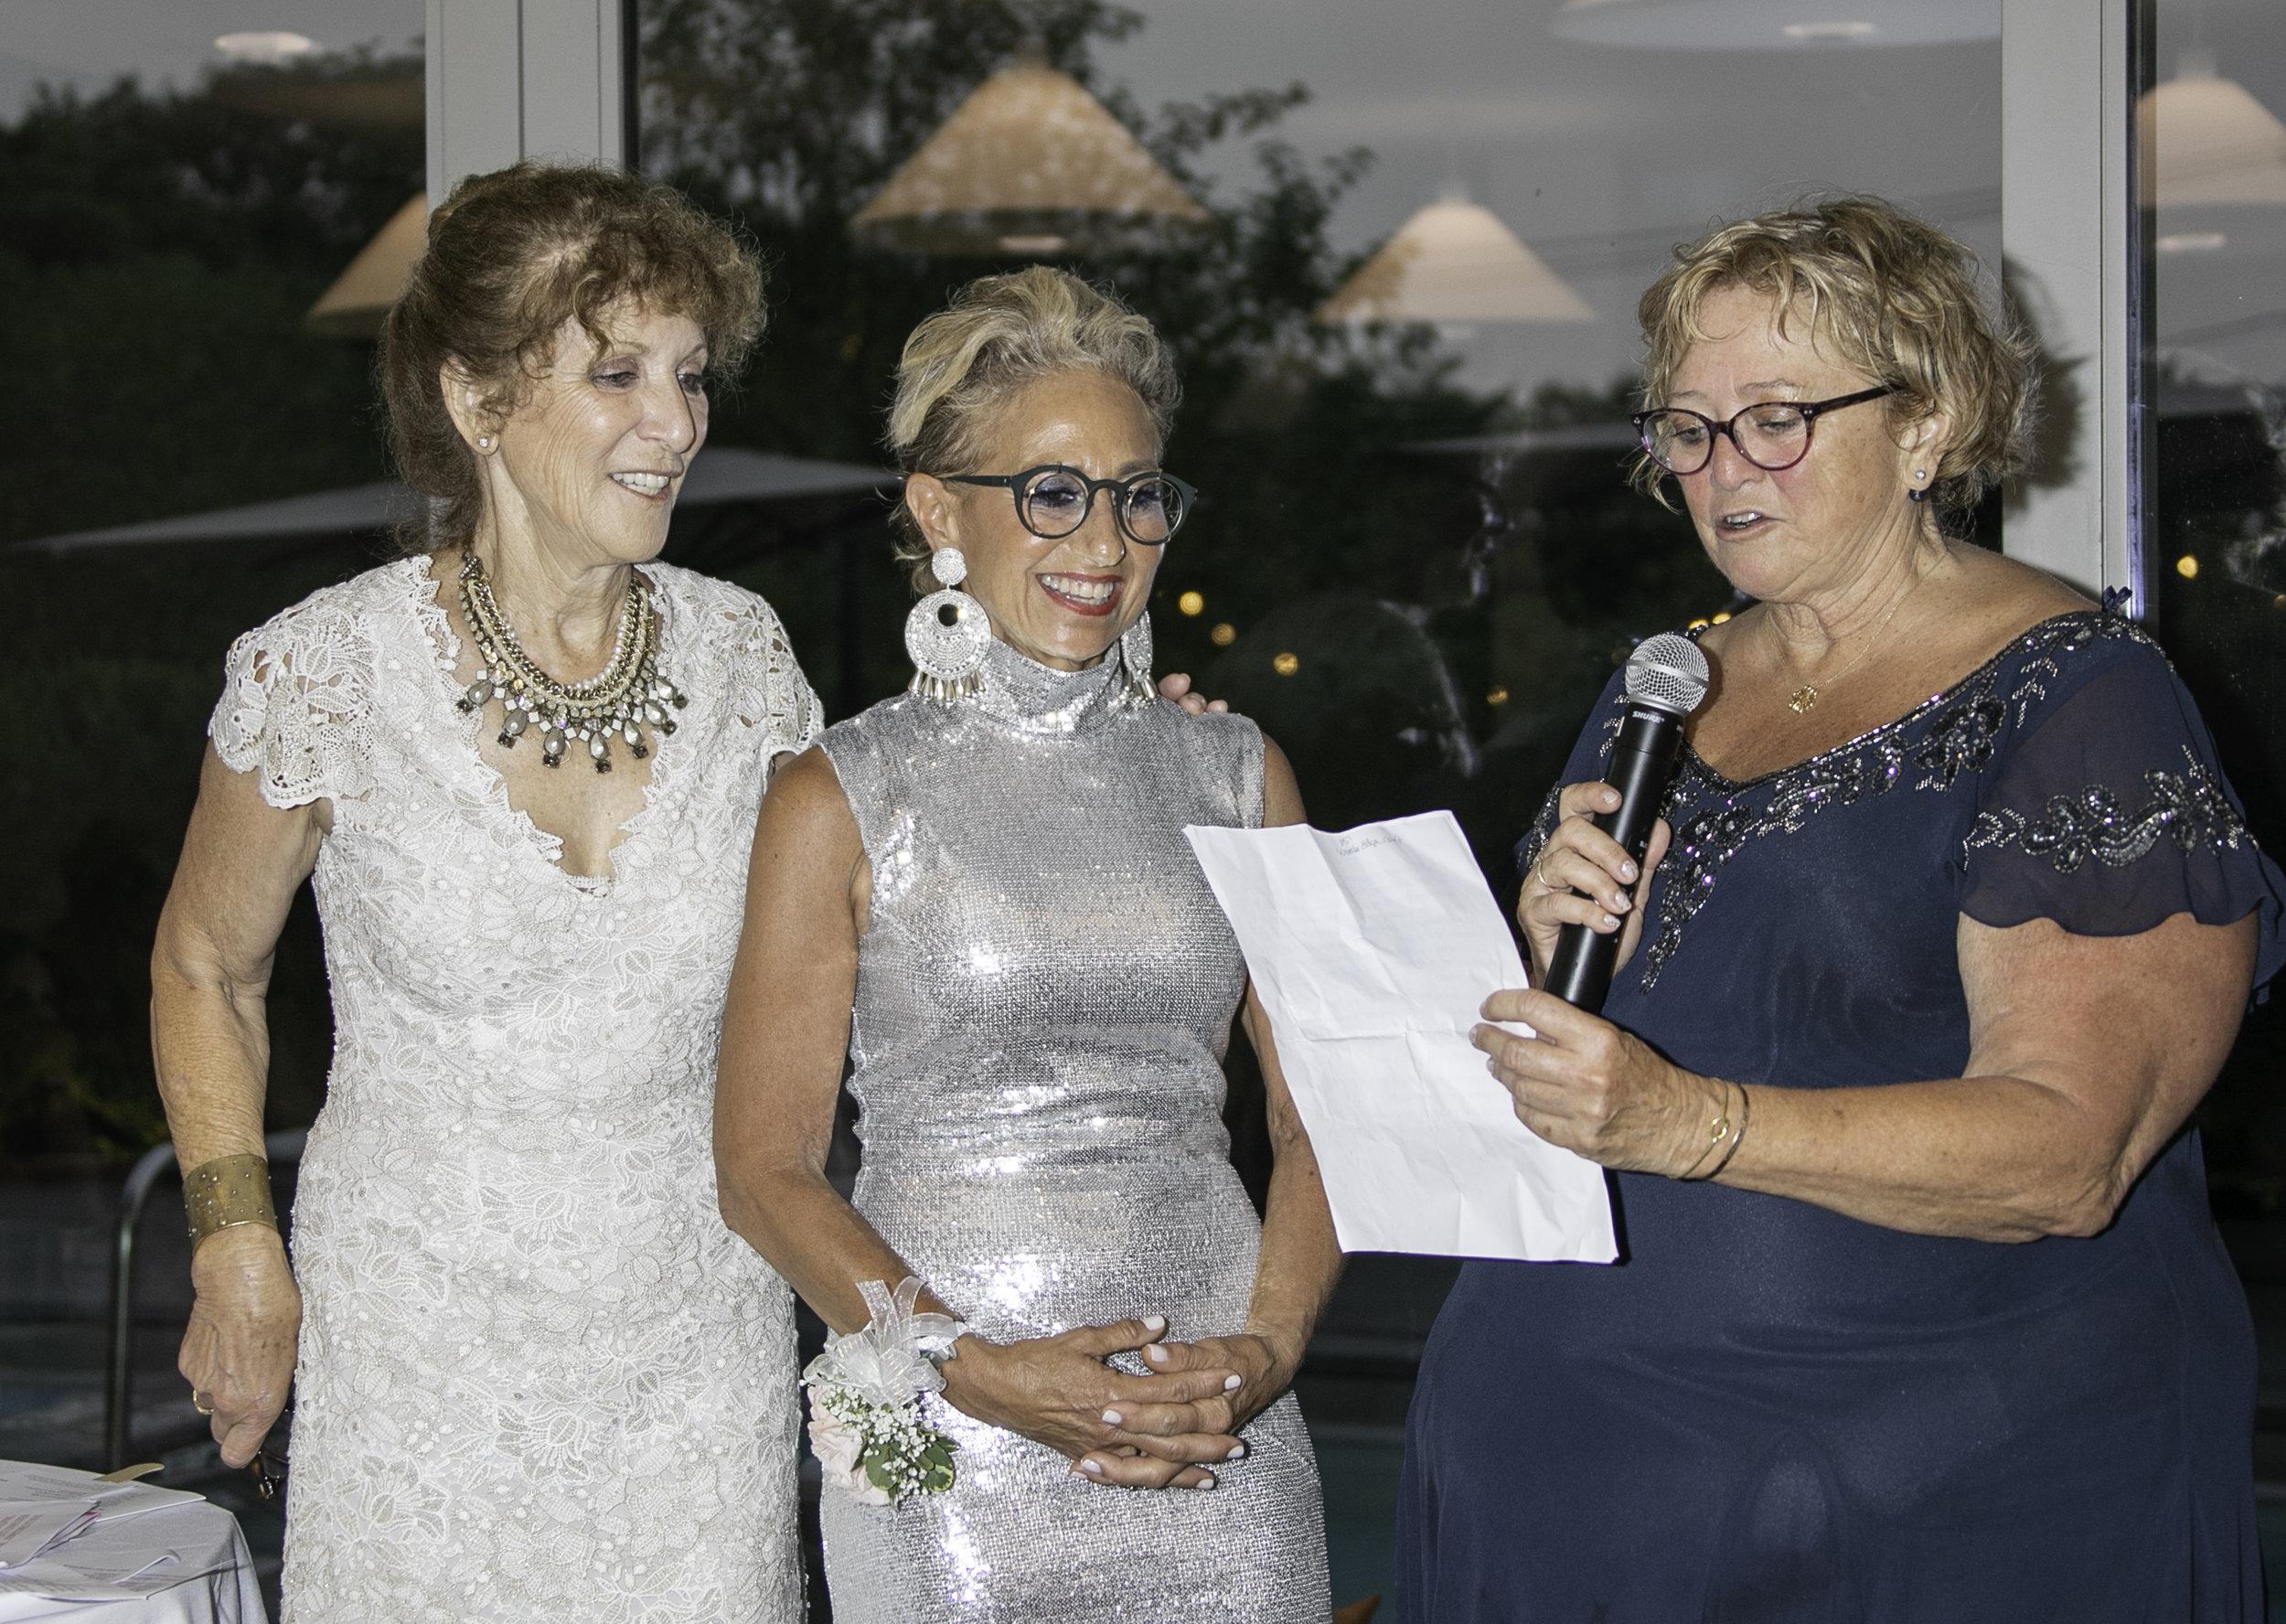 Julie Ratner (left) and Susan Roden (right) introduce honoree Jodi Wasserman (Photo: Lenny Stucker)